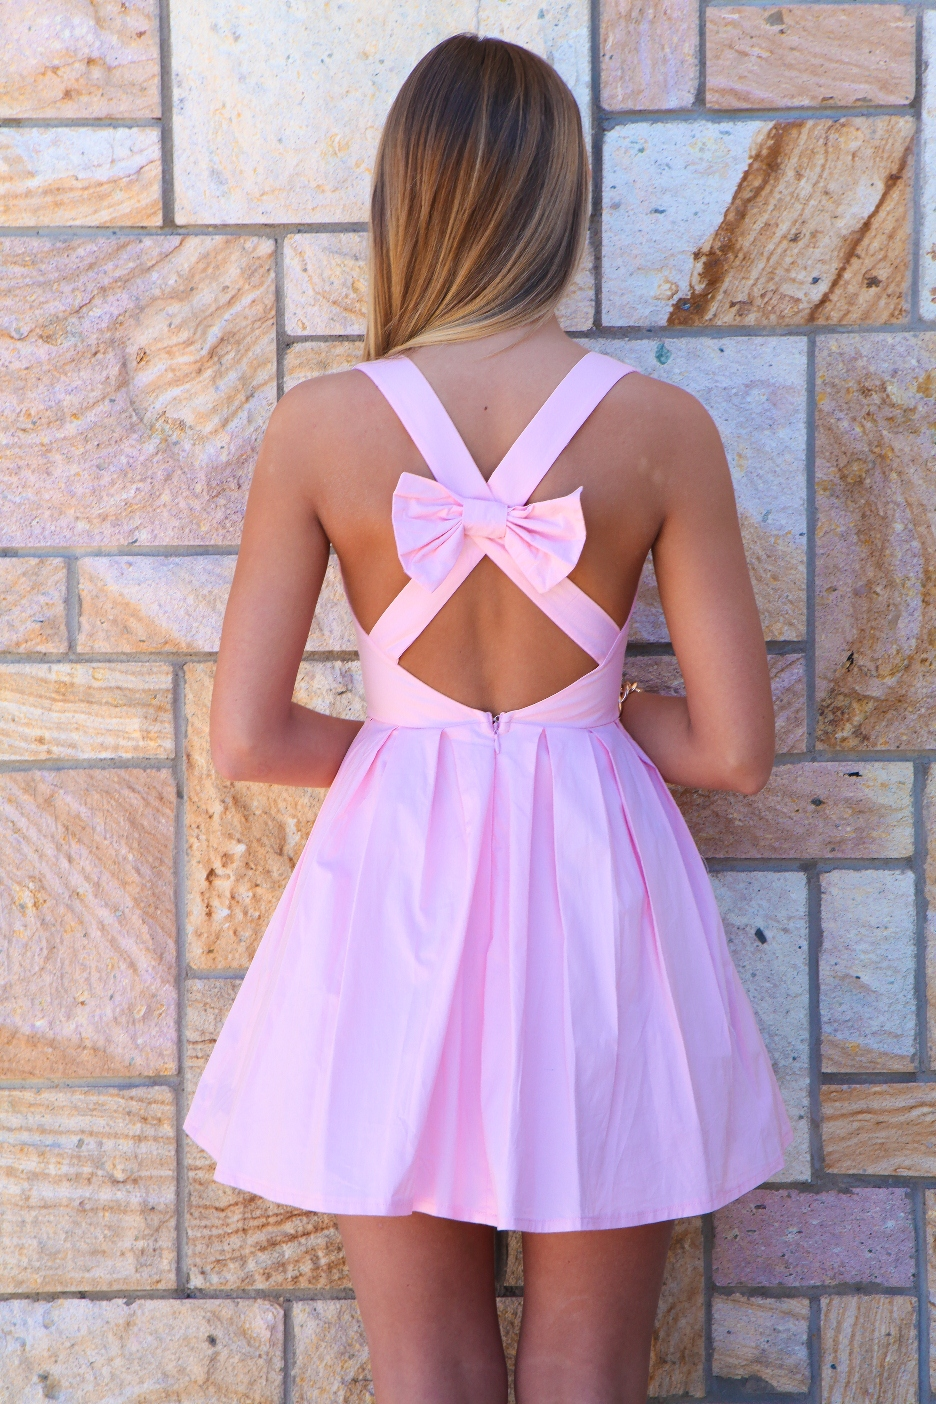 Bow Back Dress Picture Collection Dressedupgirl Com